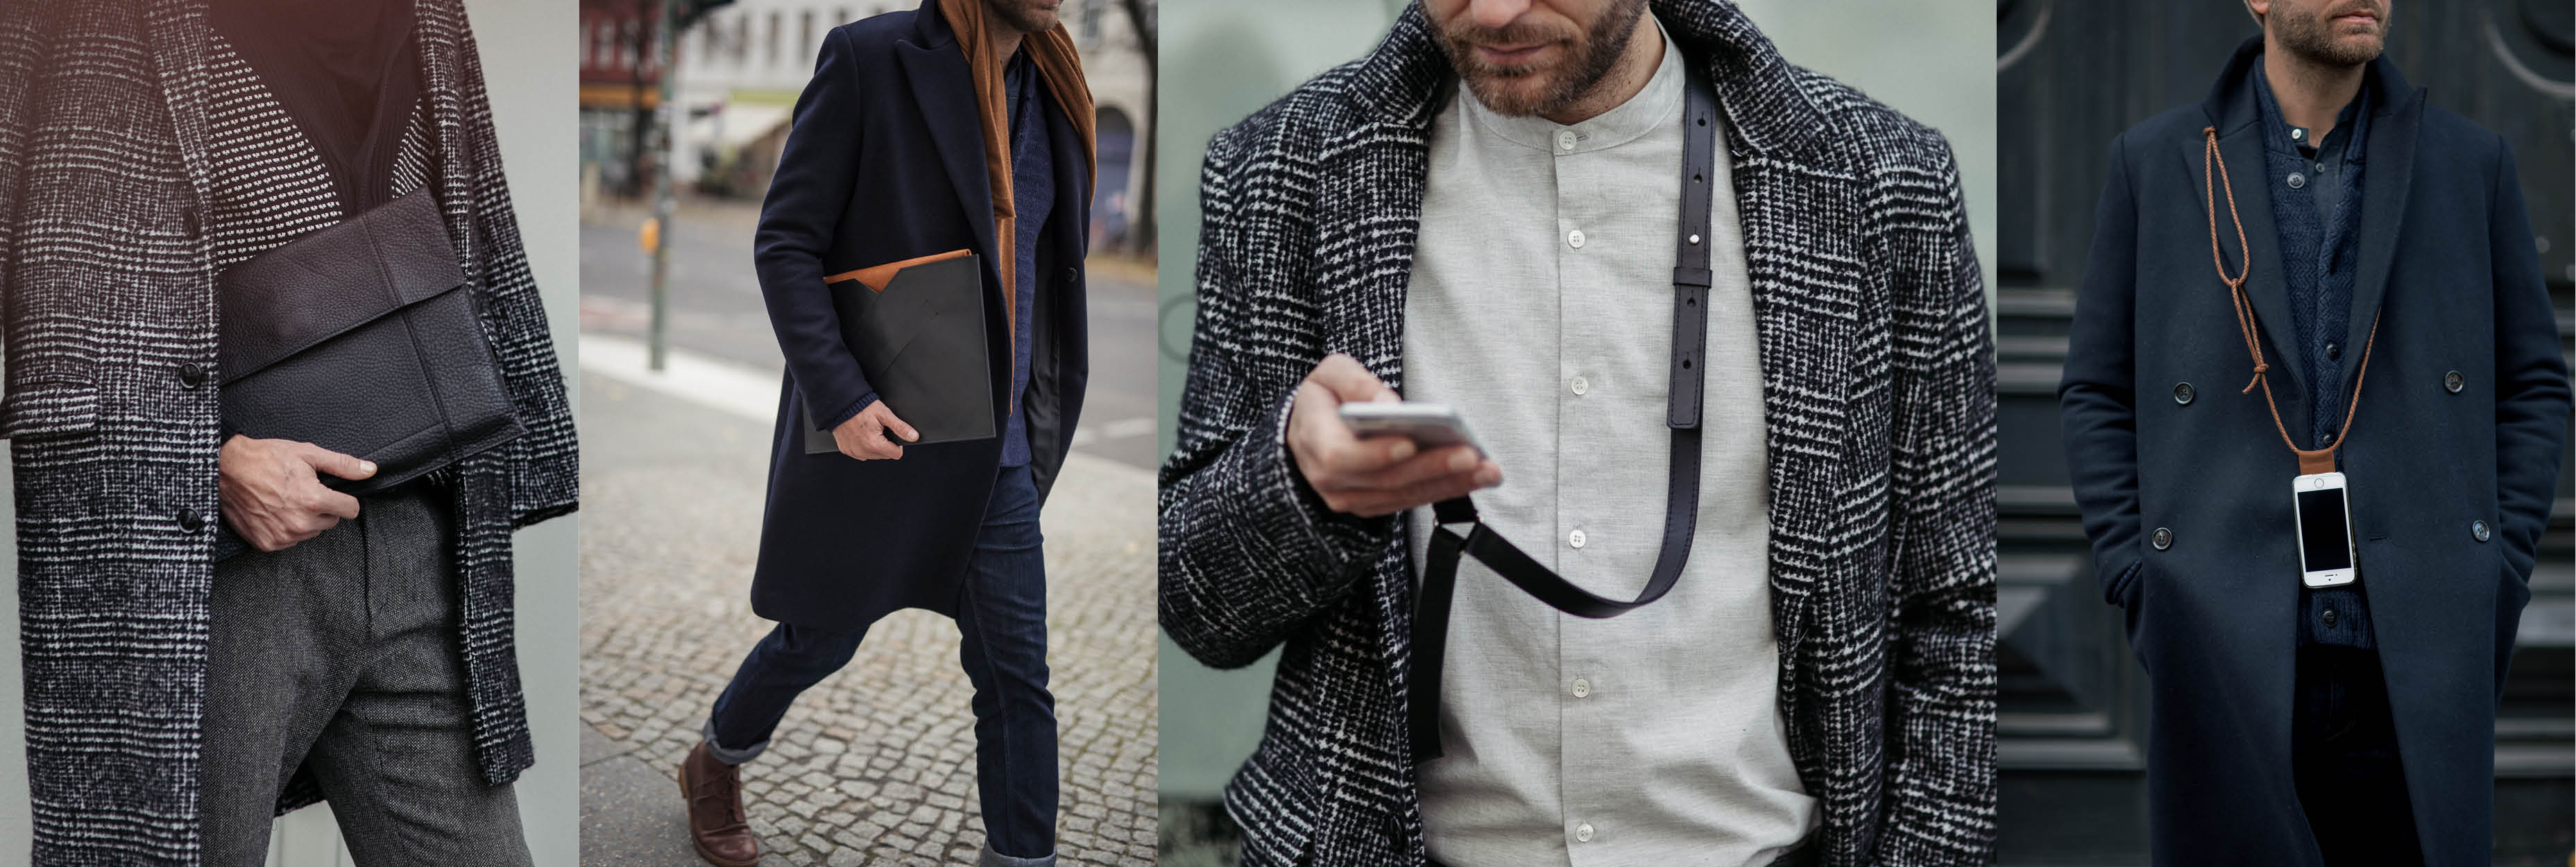 men-leather-accesorries-handmade-leder-berlin-laptophuelle-laptopsleeve-ipadsleep-ipadhuelle-iphonesleeve-iphonehuelle-wallet